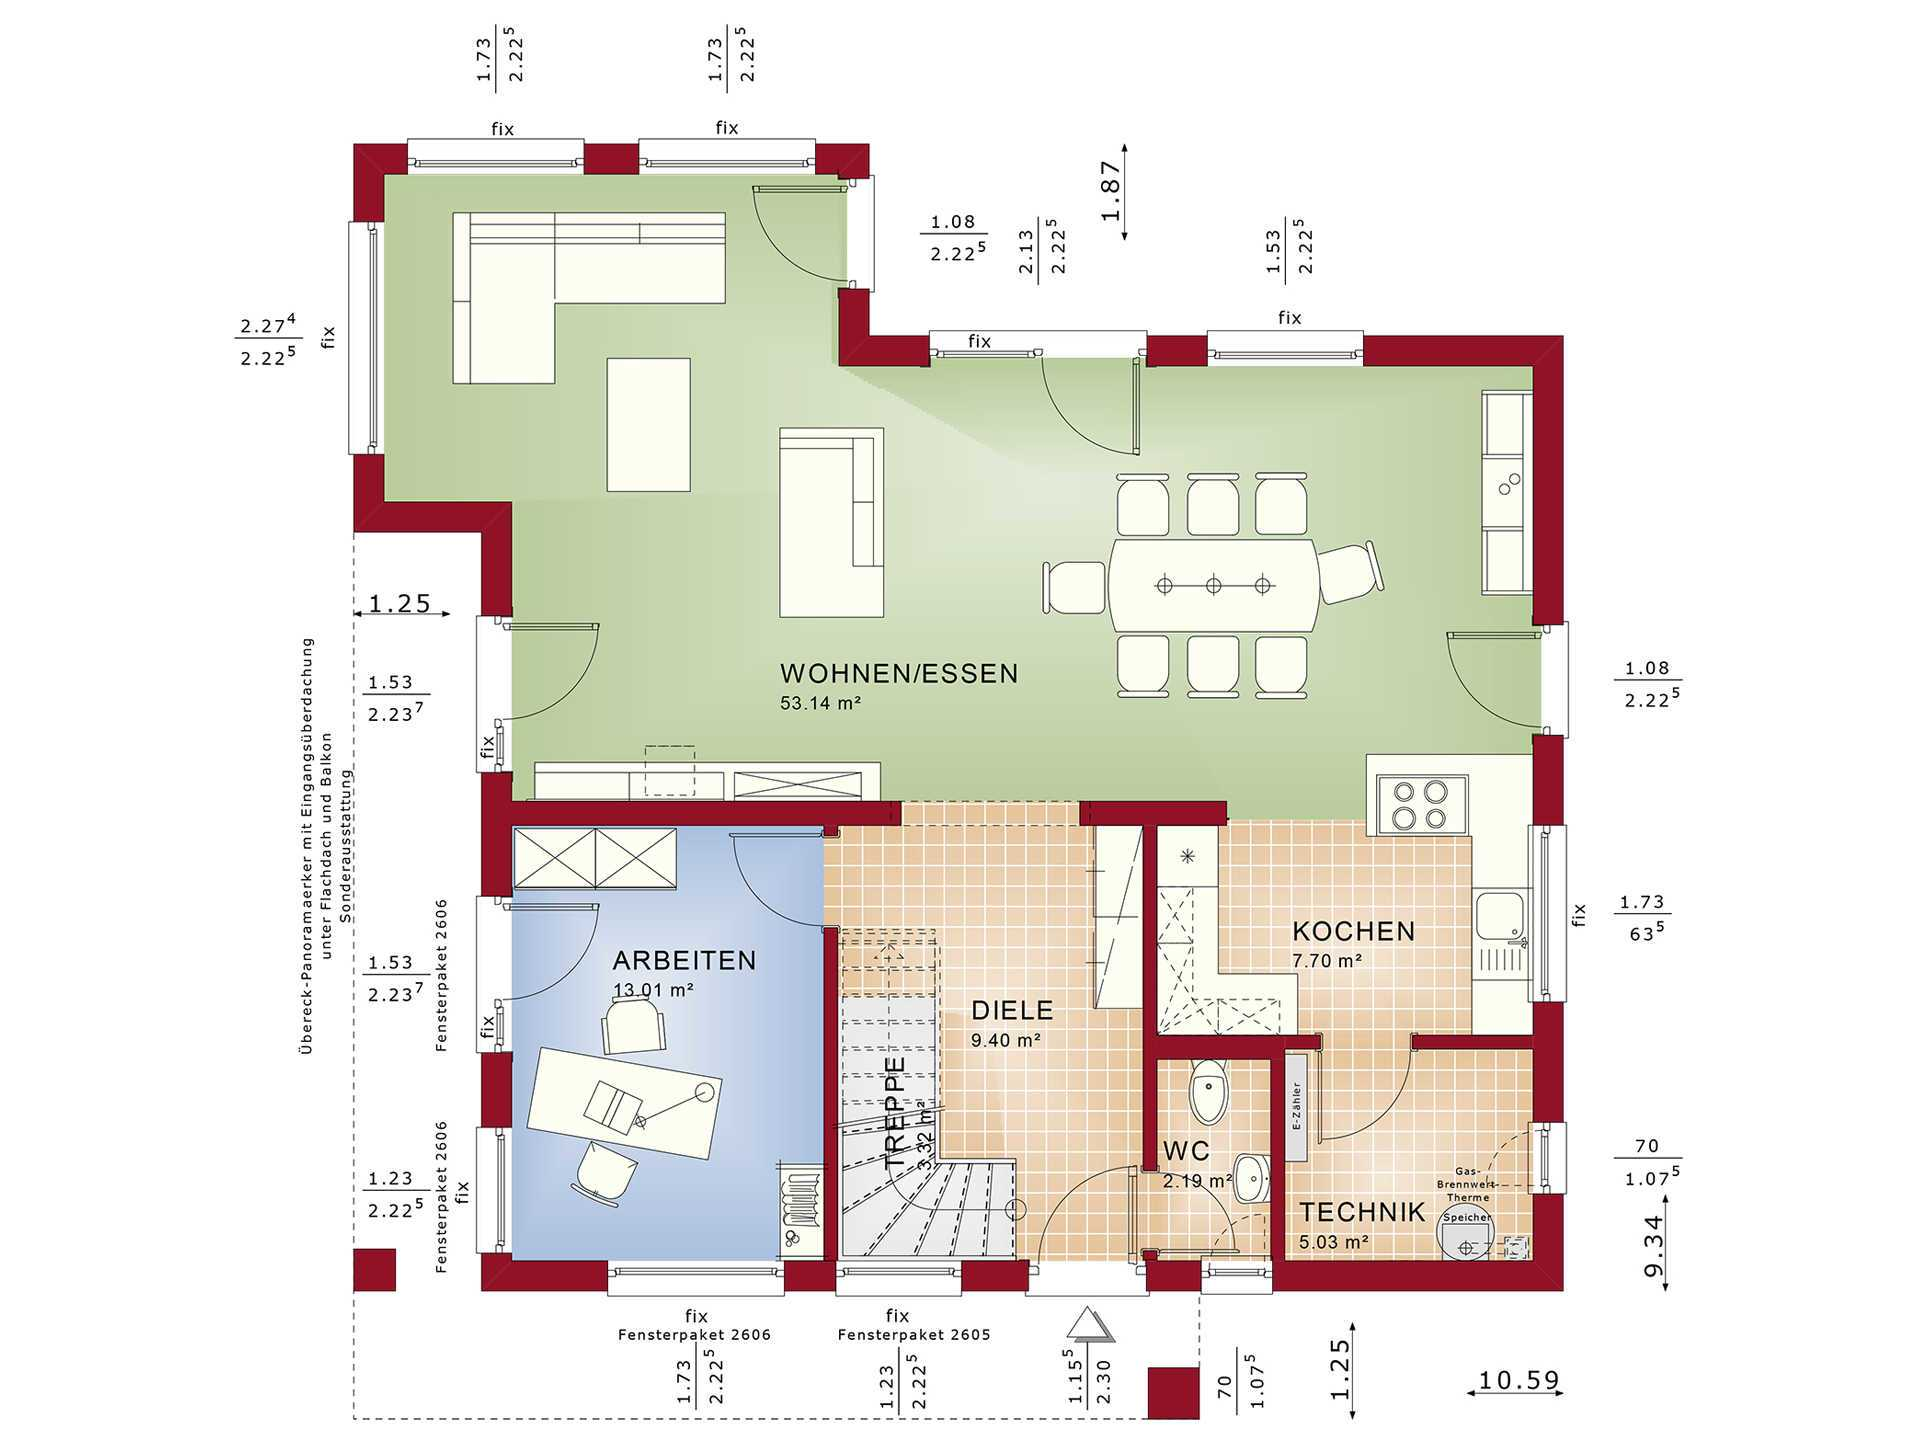 ^ ktionshaus SUNSHIN 165 - Living Haus - Bien-Zenker GmbH